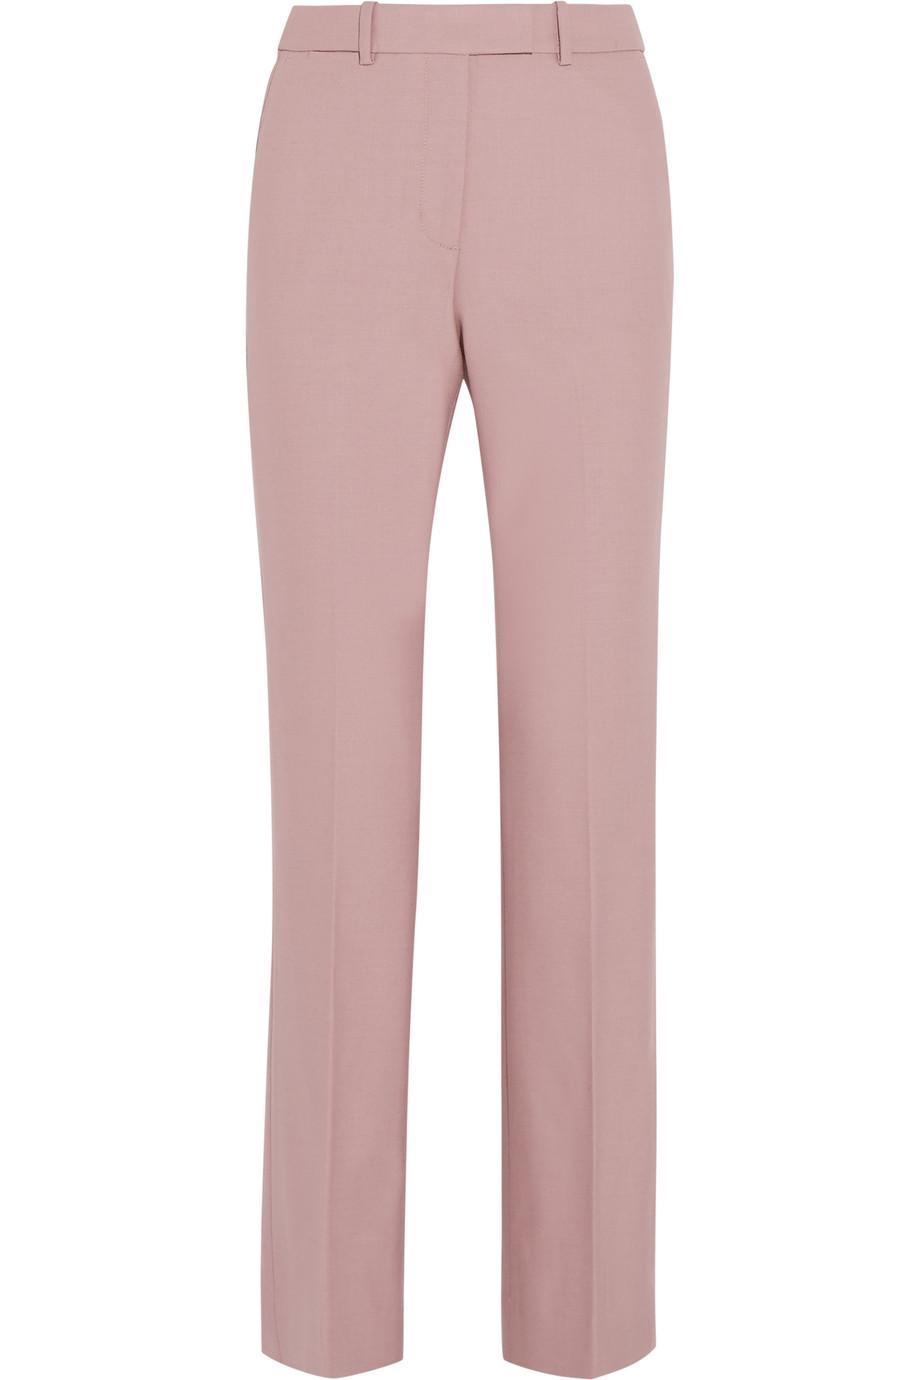 J.Crew Preston Stretch Wool-Blend Flared Pants, Antique Rose, Women's, Size: 10